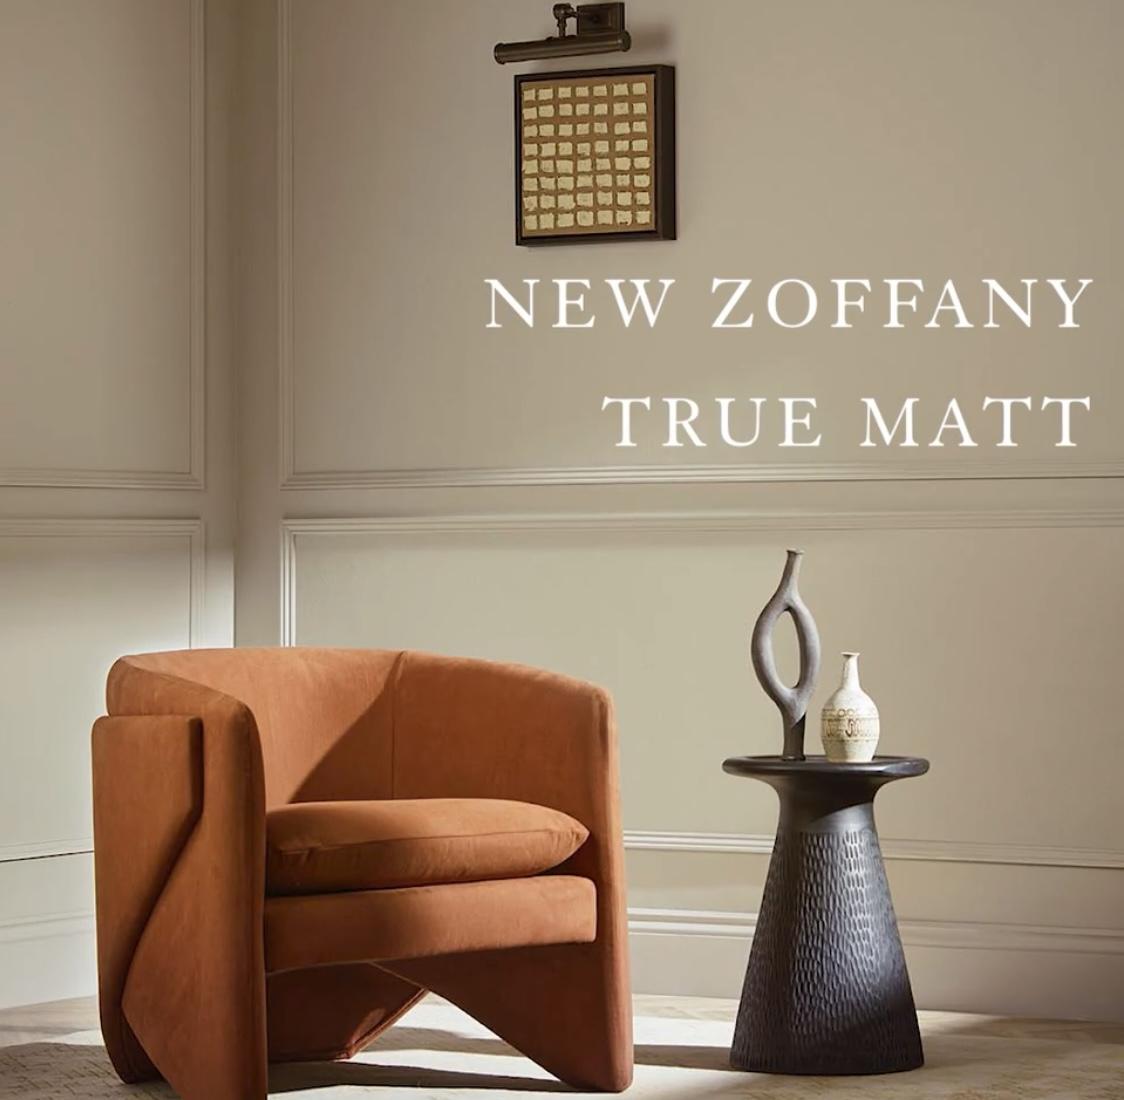 Pitture Zoffany True Matt